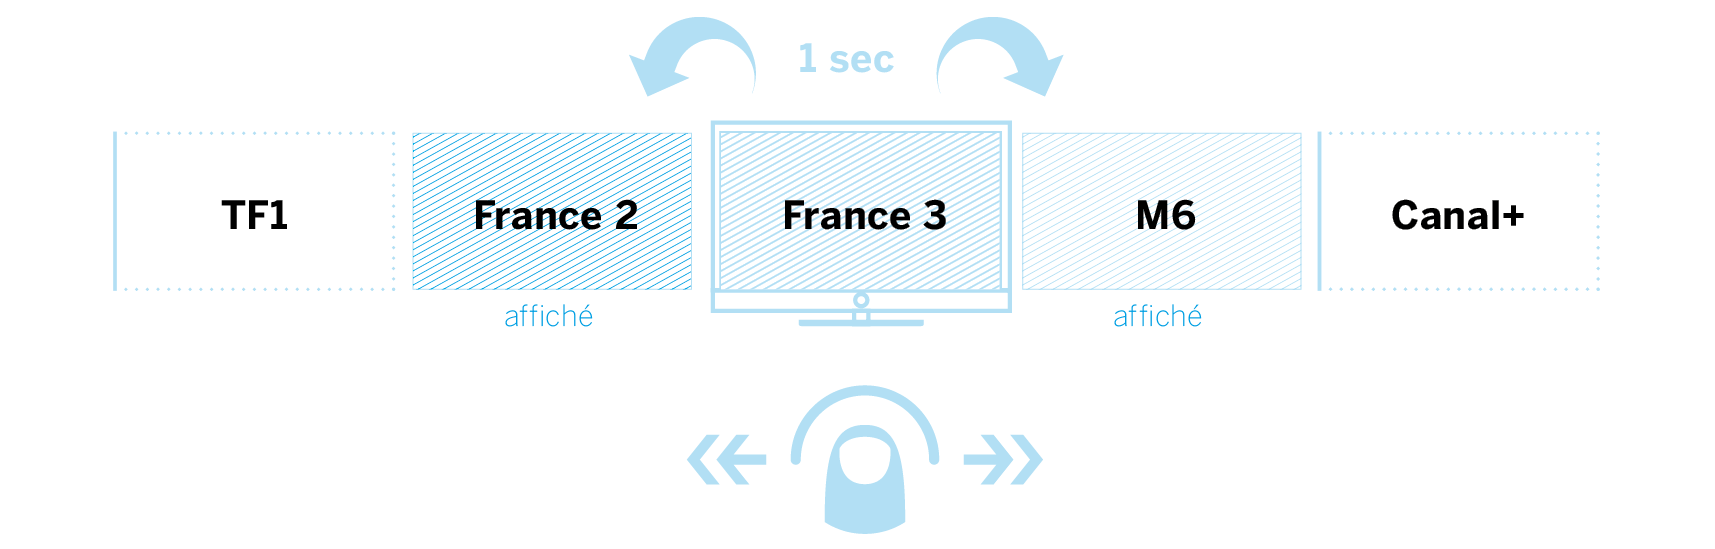 Loewe instant Channel ChangementLoewe instant Channel Changement rapide des chaînes. Loewe Connect 40 DR+ UHD controlsound